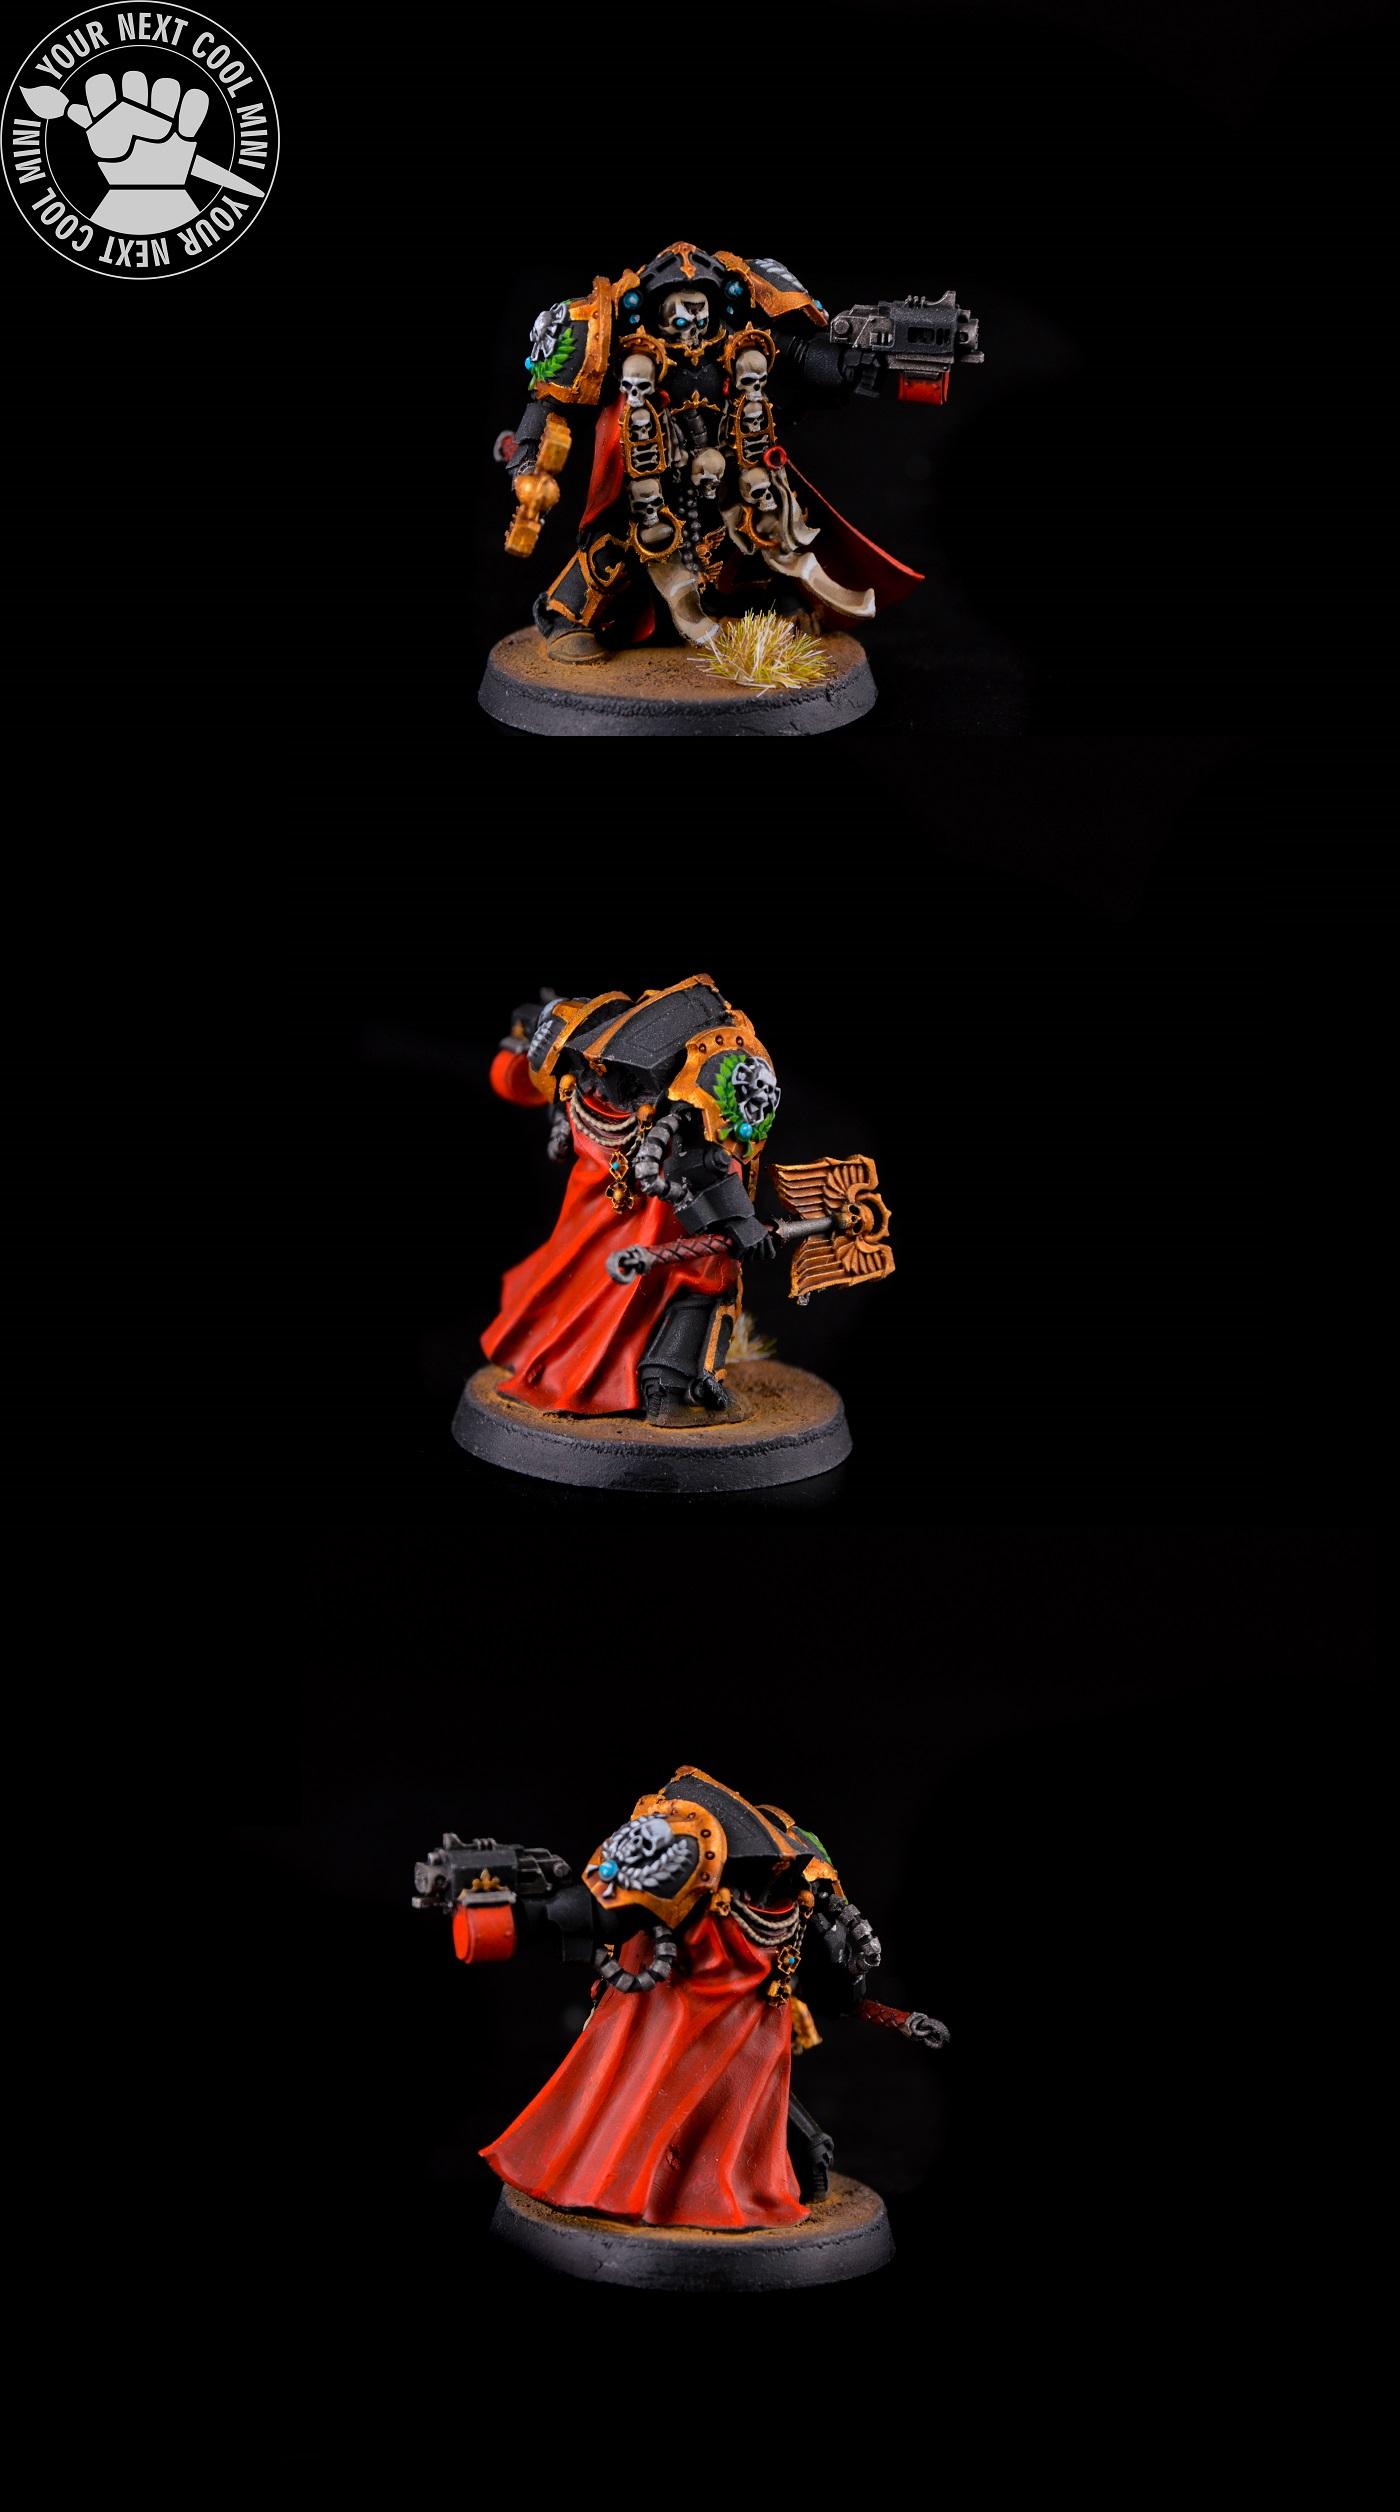 Warhammer 40k chaplain in termo armor